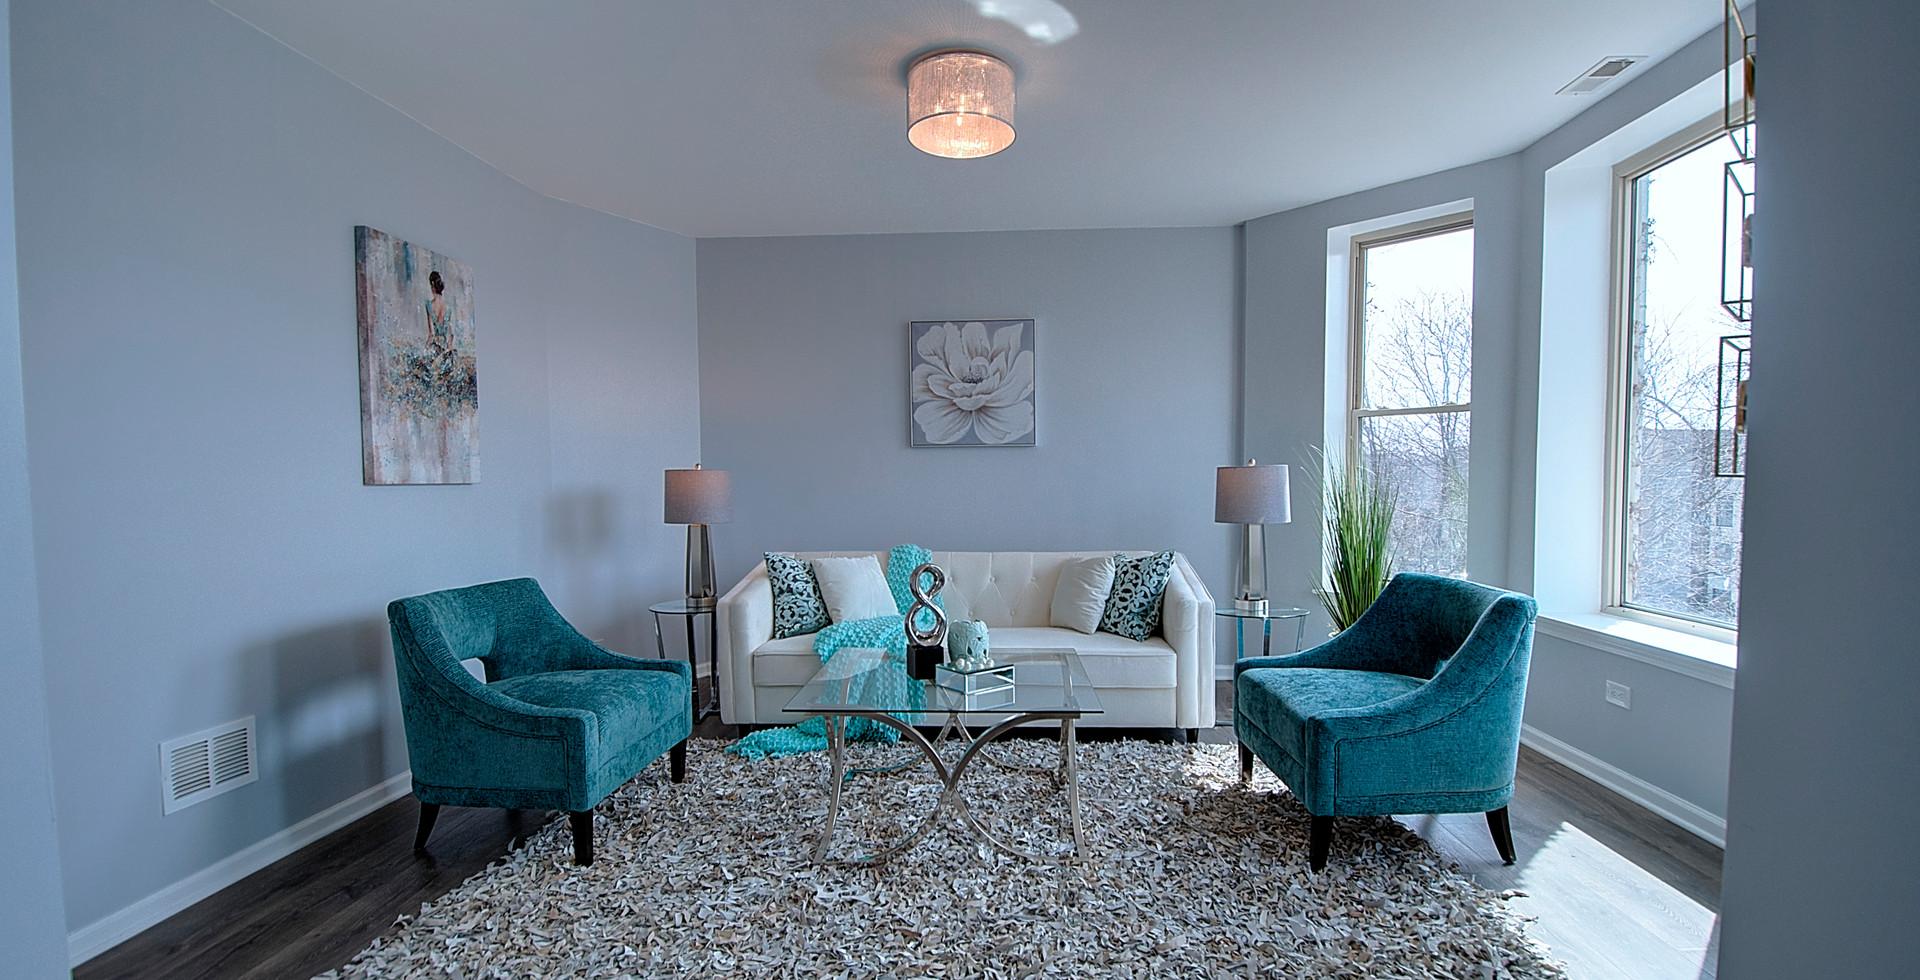 Living Room in Oak Park designed by MRM Home Design.jpg